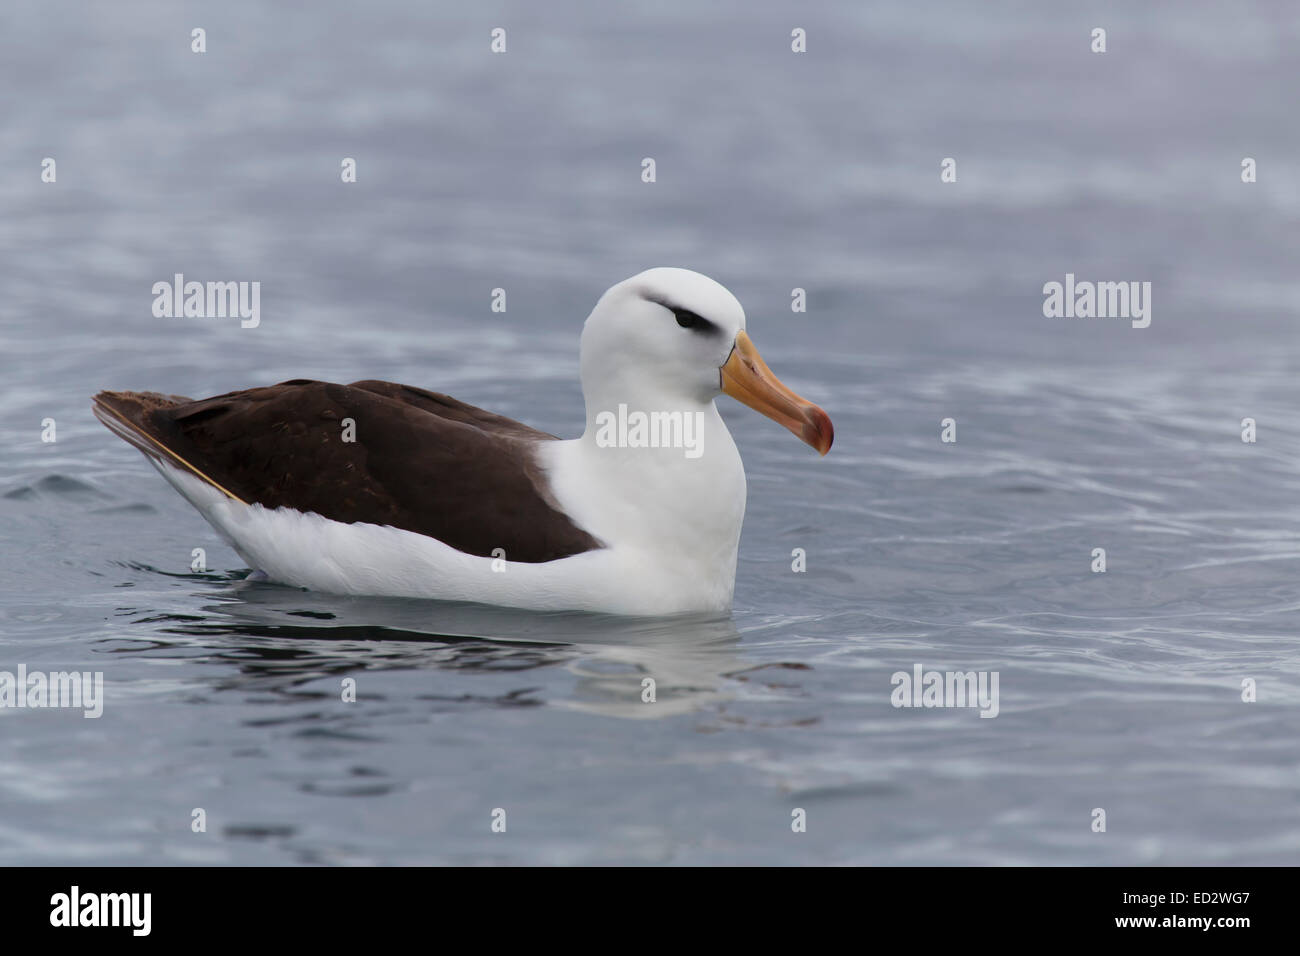 Black-browed albatross (Thalassarche melanophrys), Cooper Bay, South Georgia, Antarctica. - Stock Image